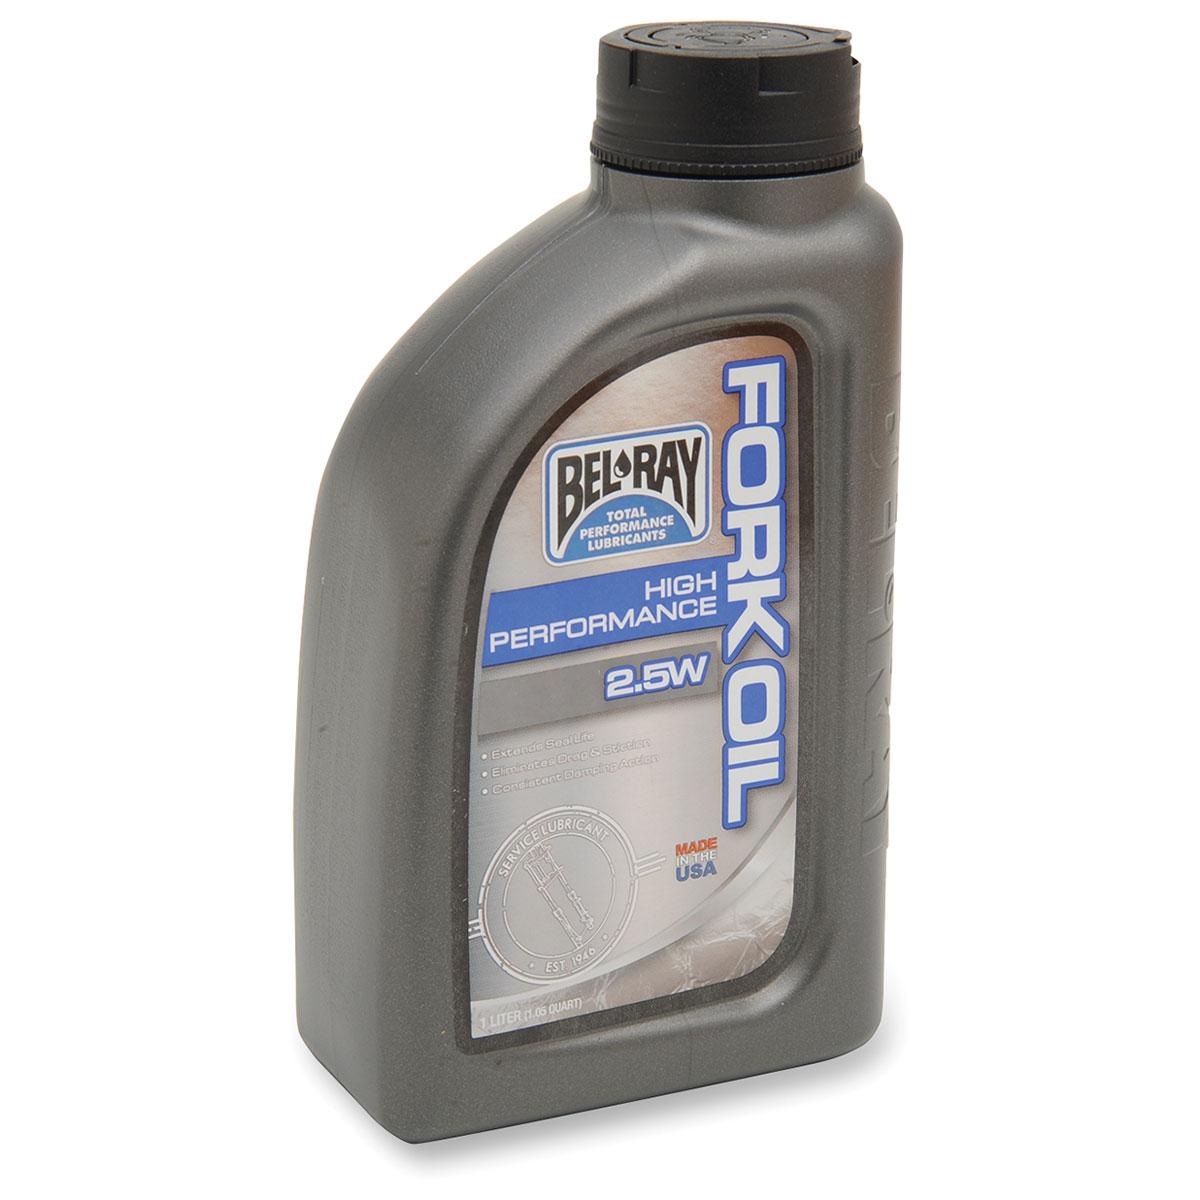 Bel-Ray High-Performance 2.5W Fork Oil Liter